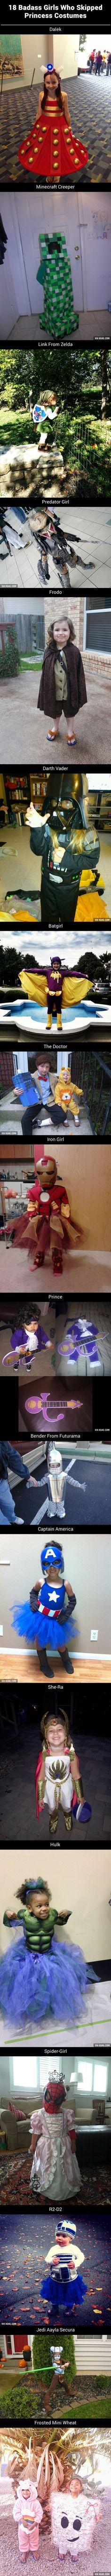 18 Bada*s Girls Who Skipped Princess Costumes